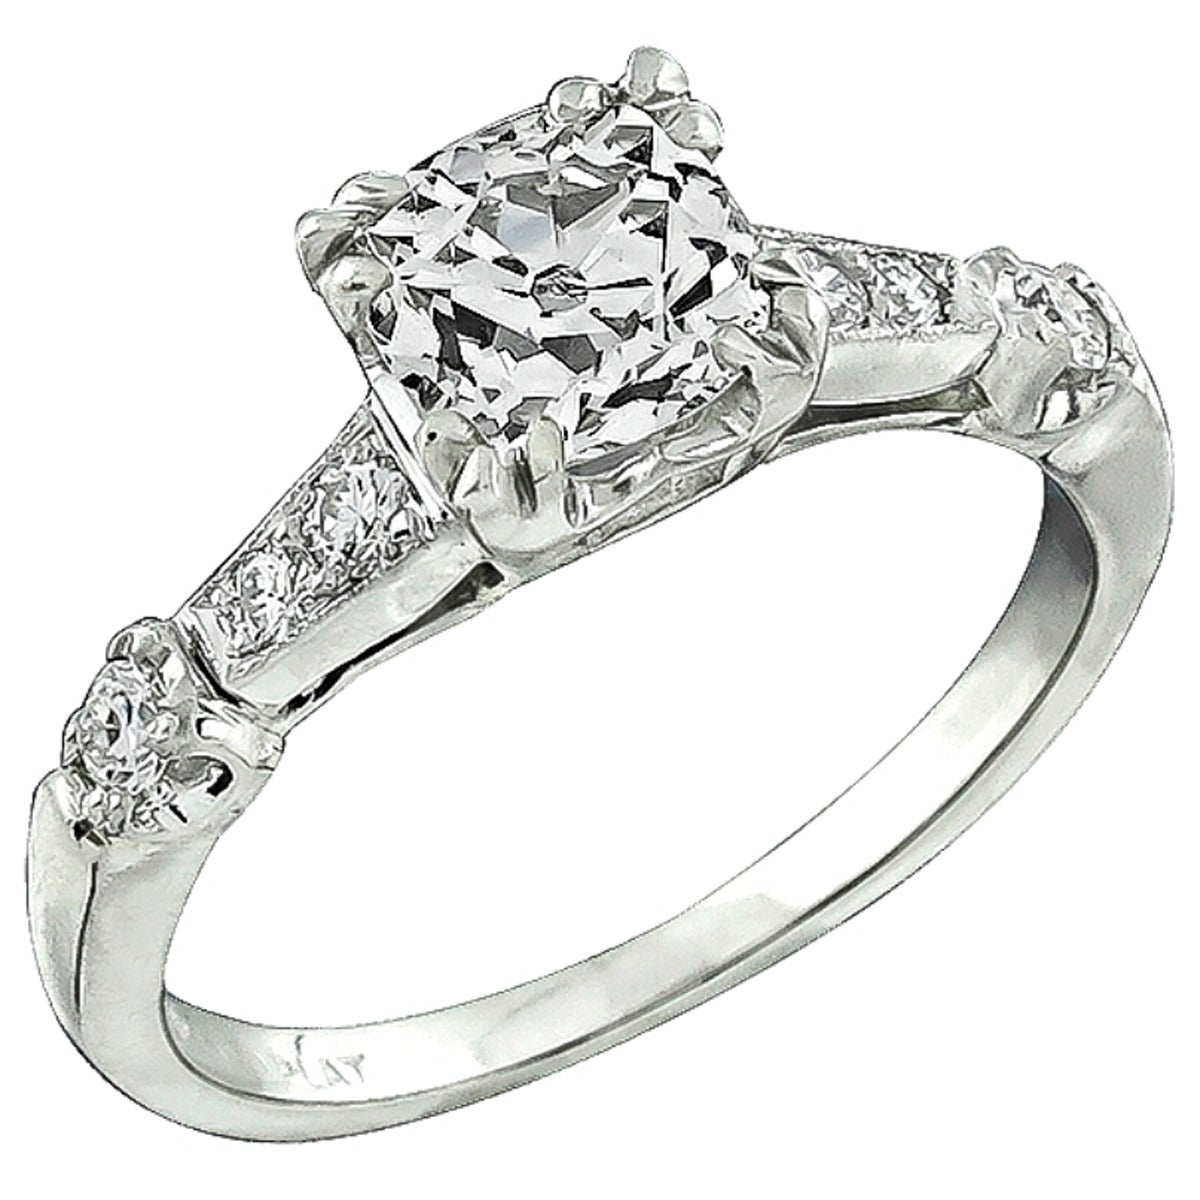 1930s 1.13ct Diamond Engagement Ring